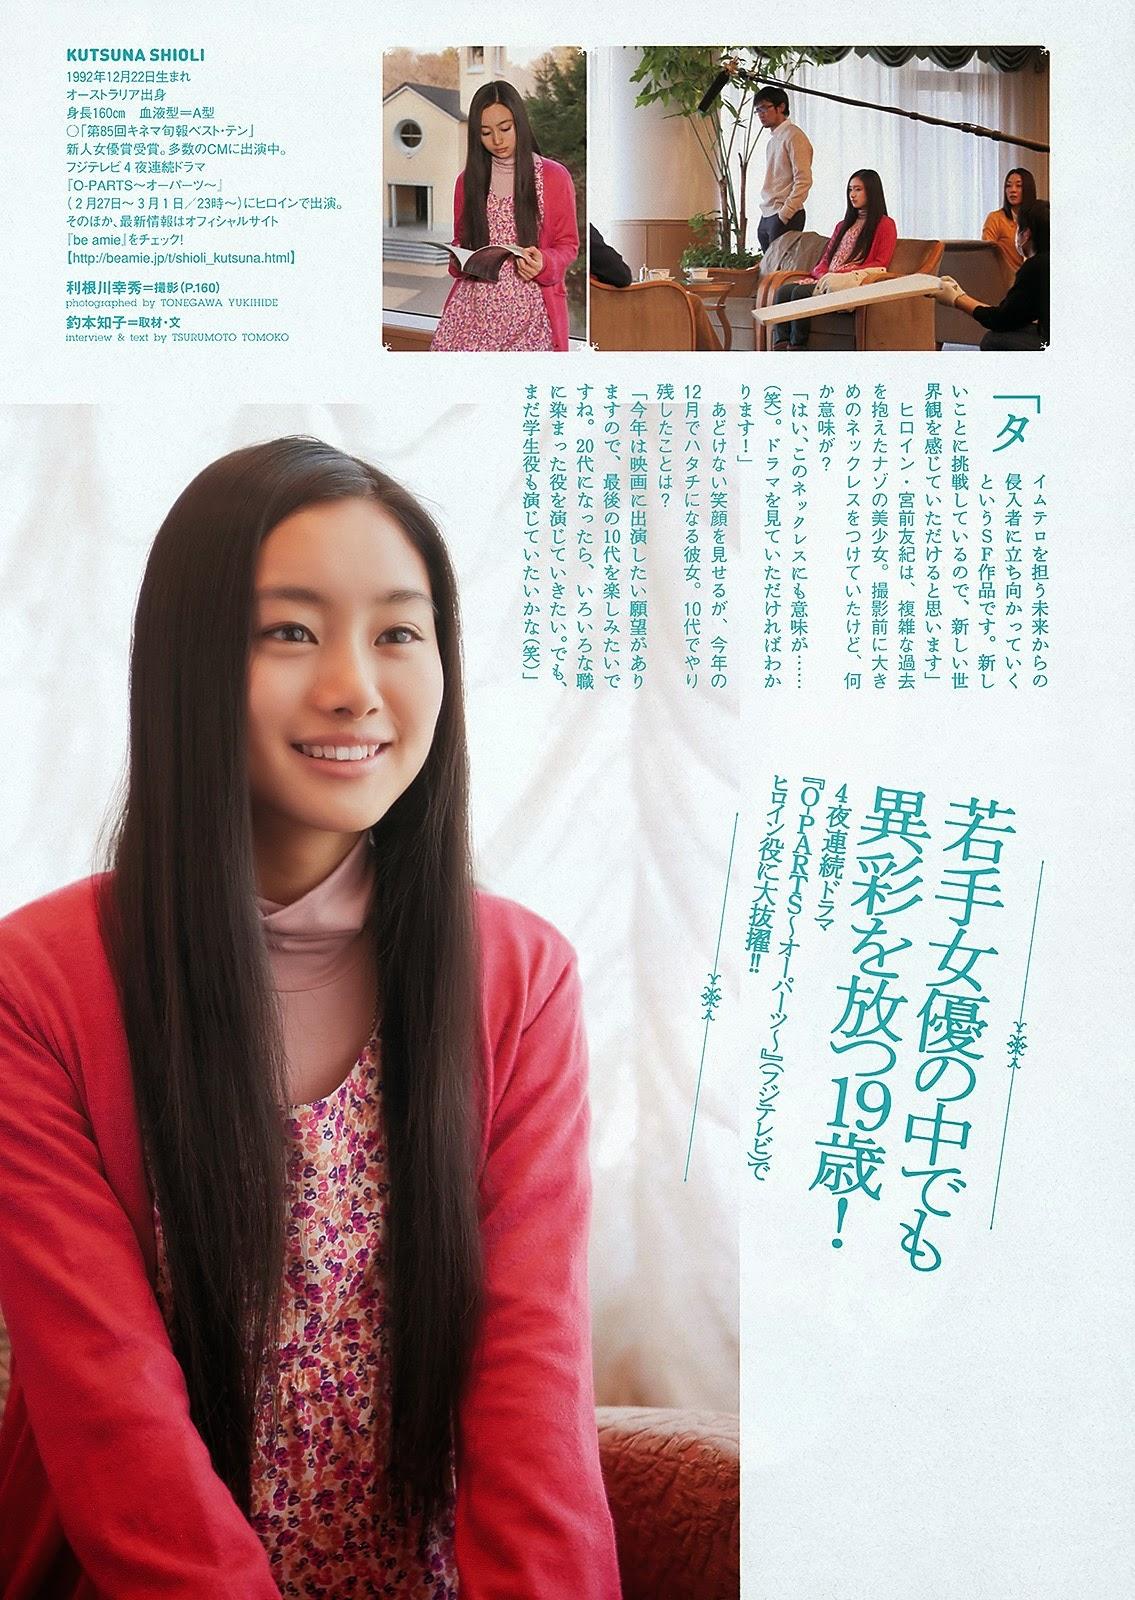 Kutsuna Shiori 忽那汐里 Weekly Playboy No 11 2012 Pictures 4